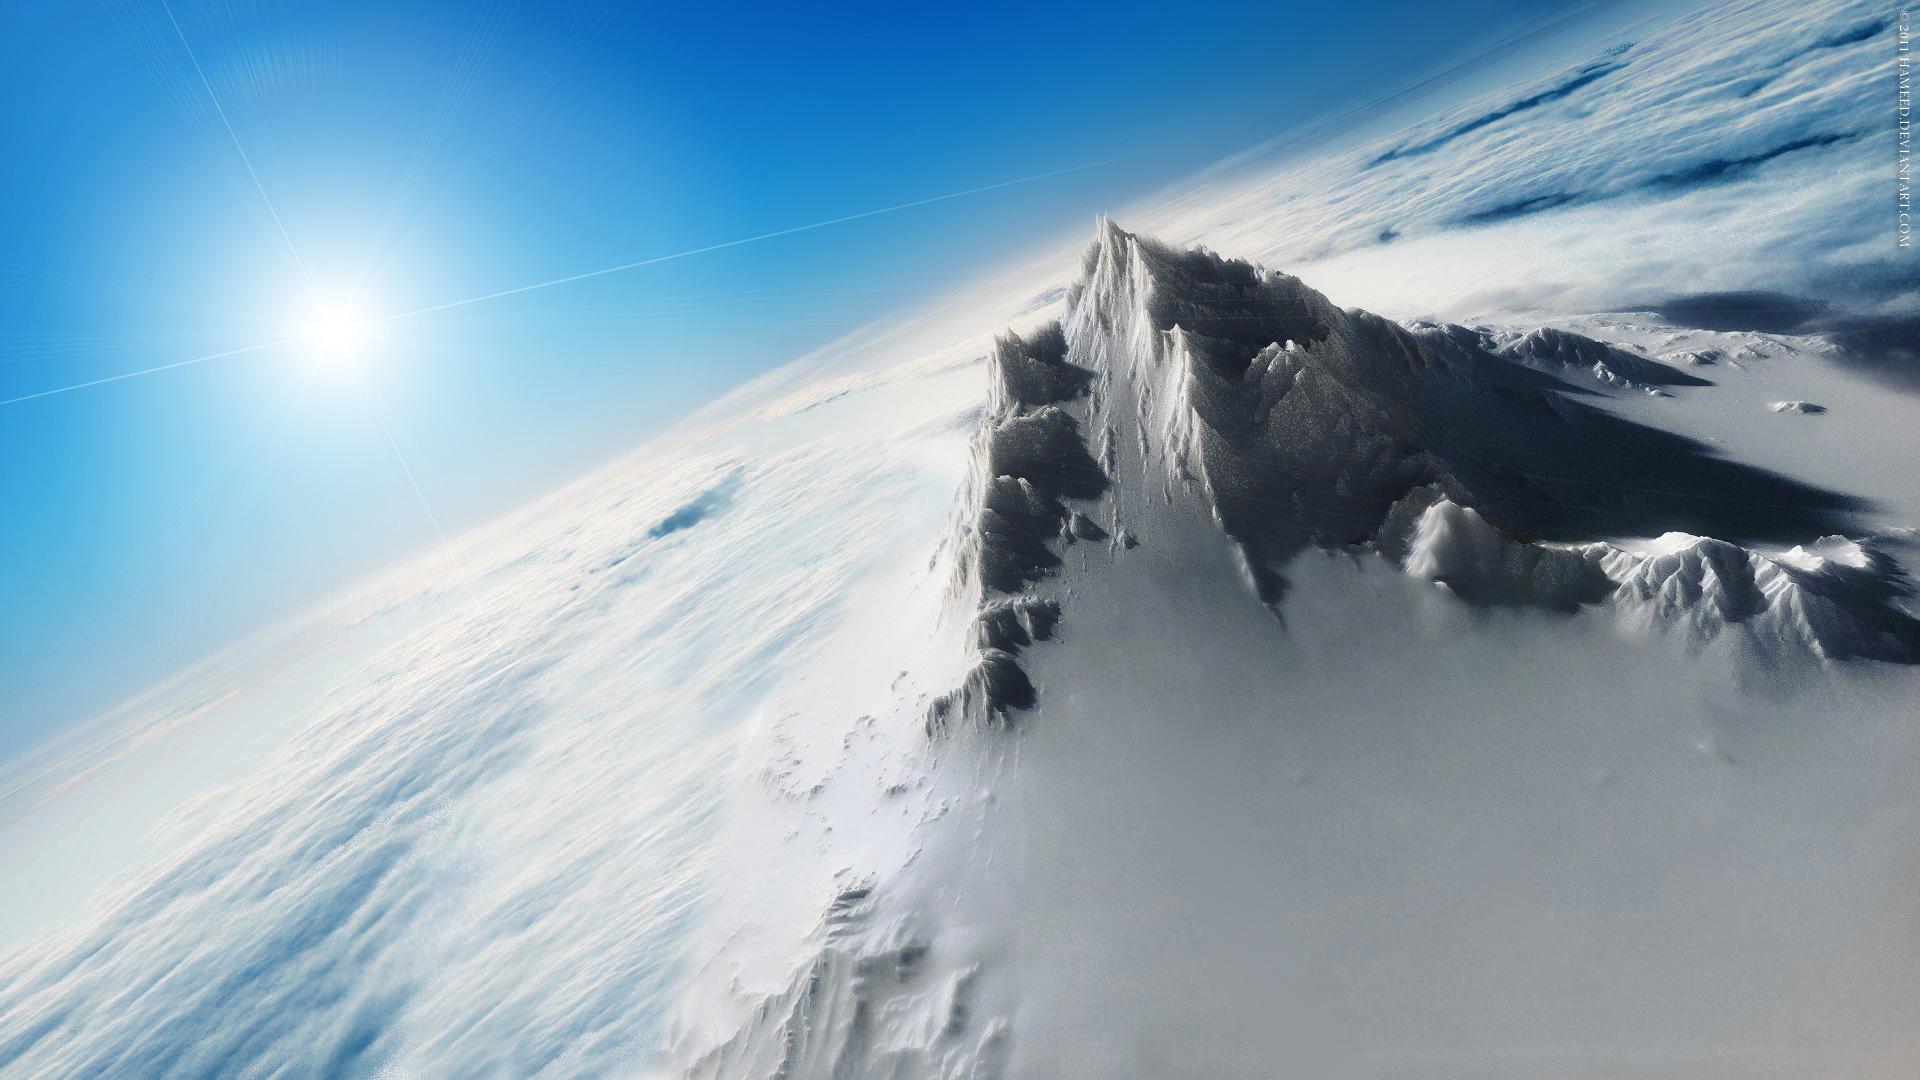 Iphone 4 3d Wallpaper Ios 7 Snow Peak Wallpapers Hd Wallpapers Id 10221